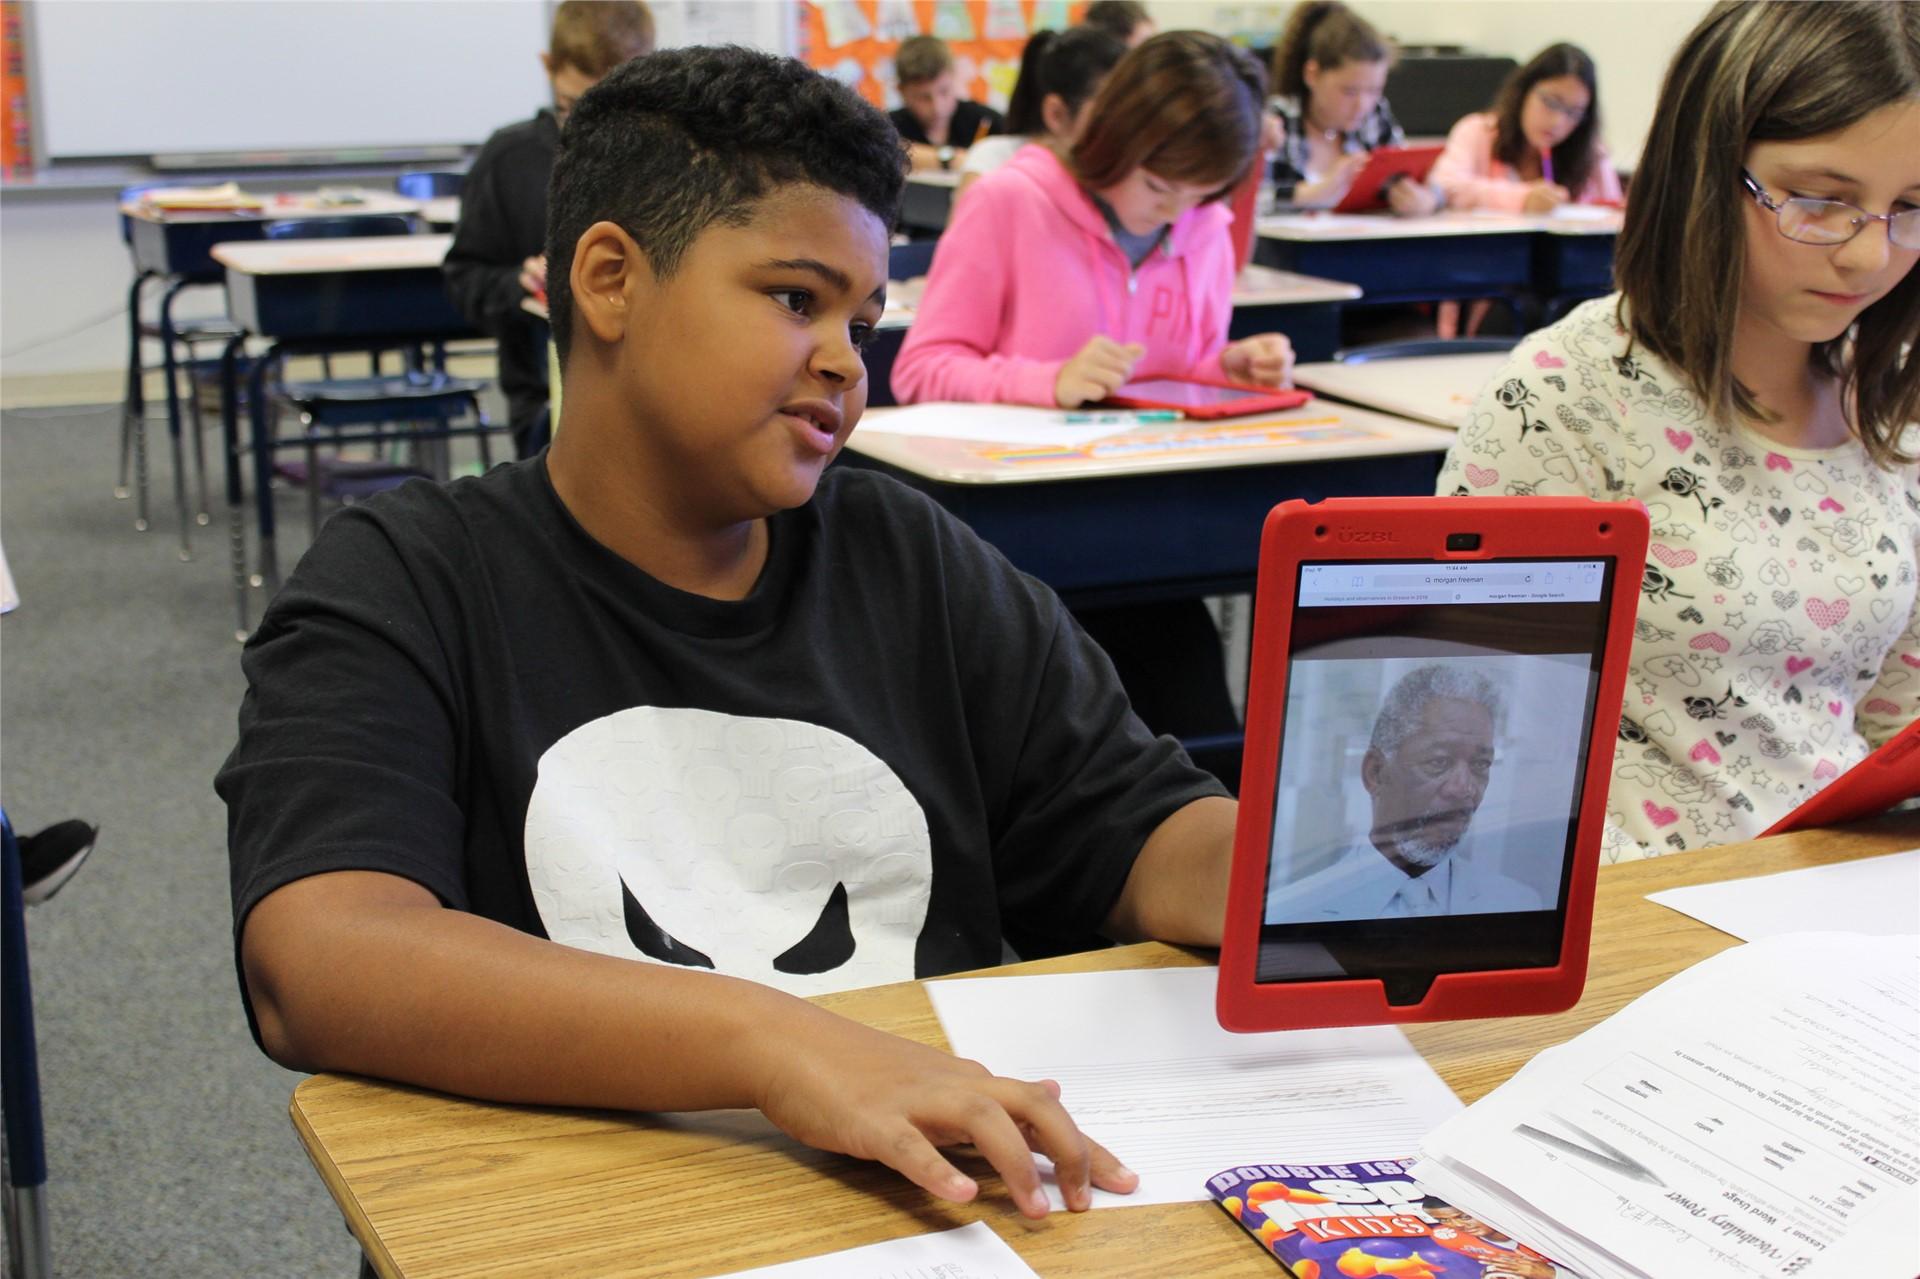 Student Using iPad